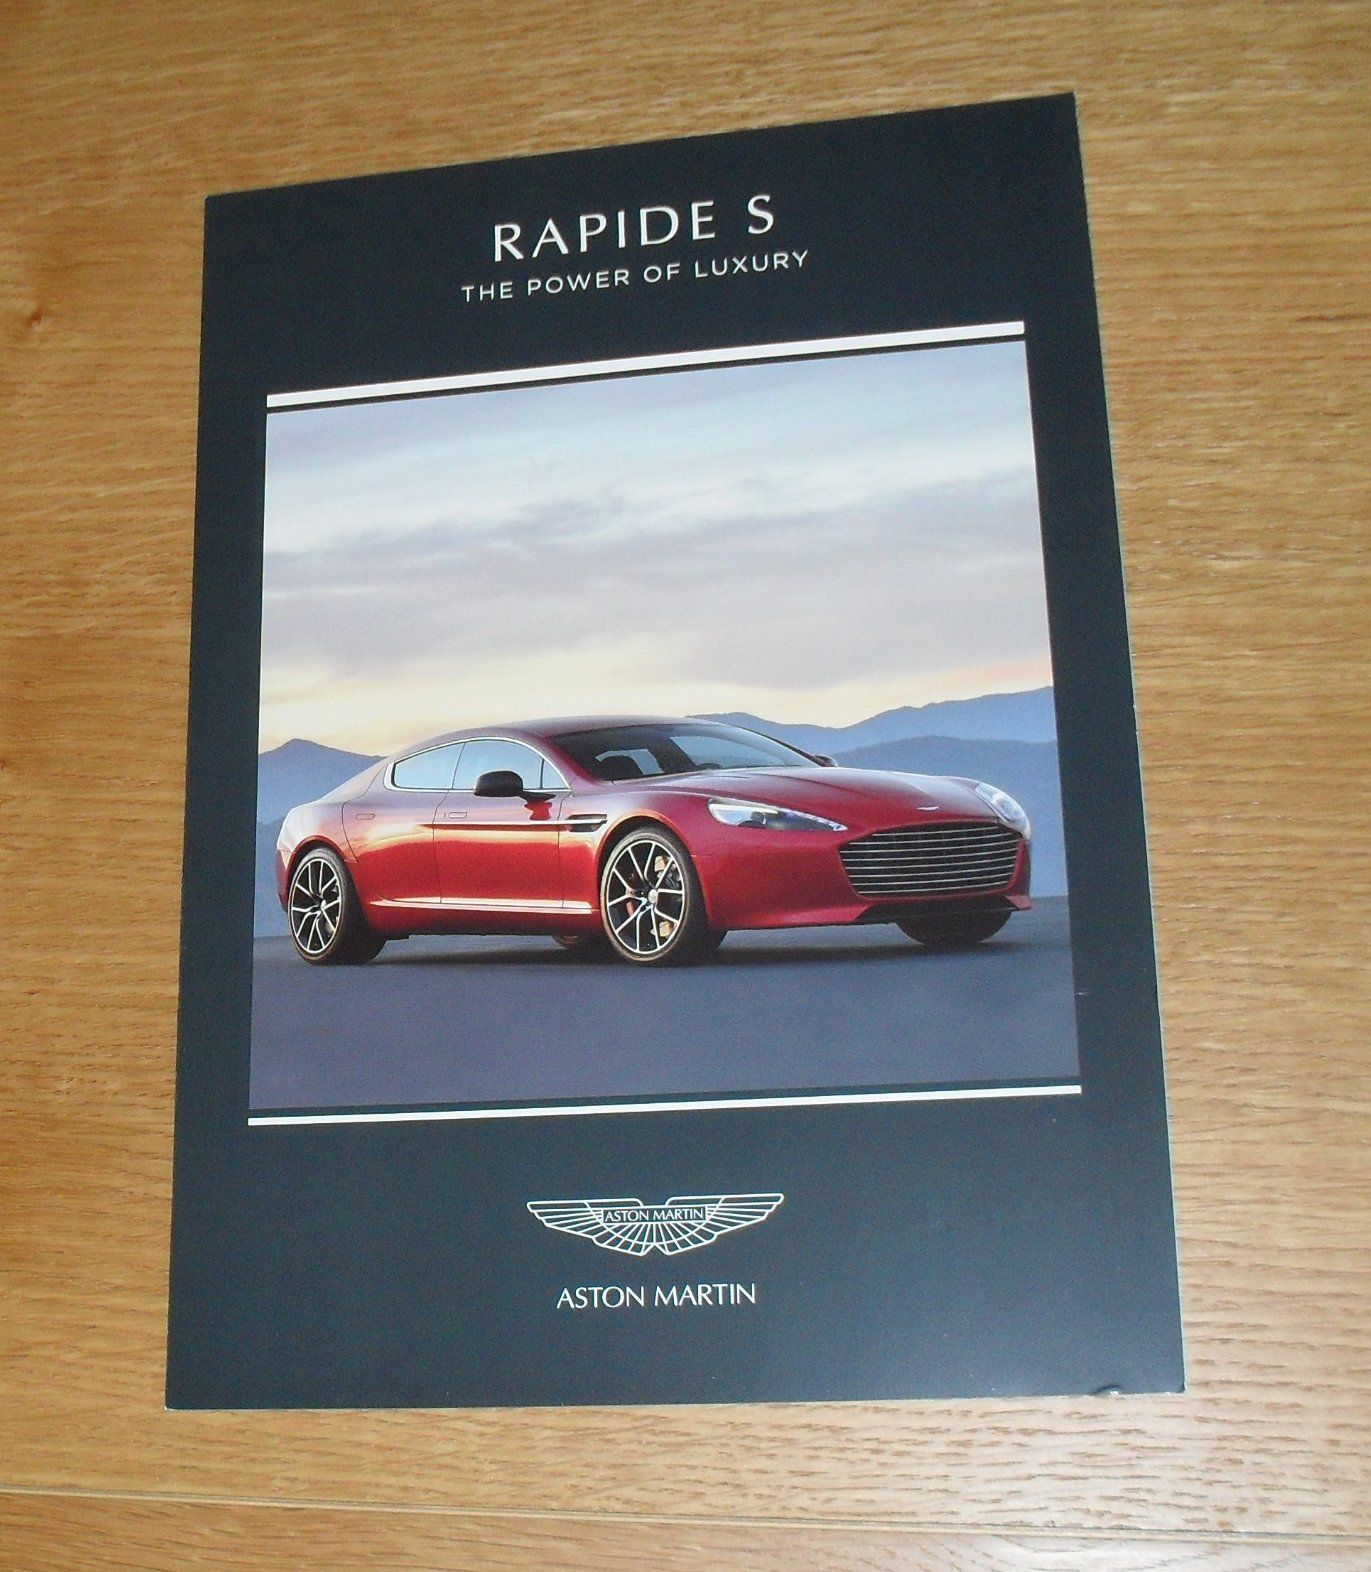 Cool Amazing Aston Martin Rapide S Price Guide 2015 2017/2018 ...